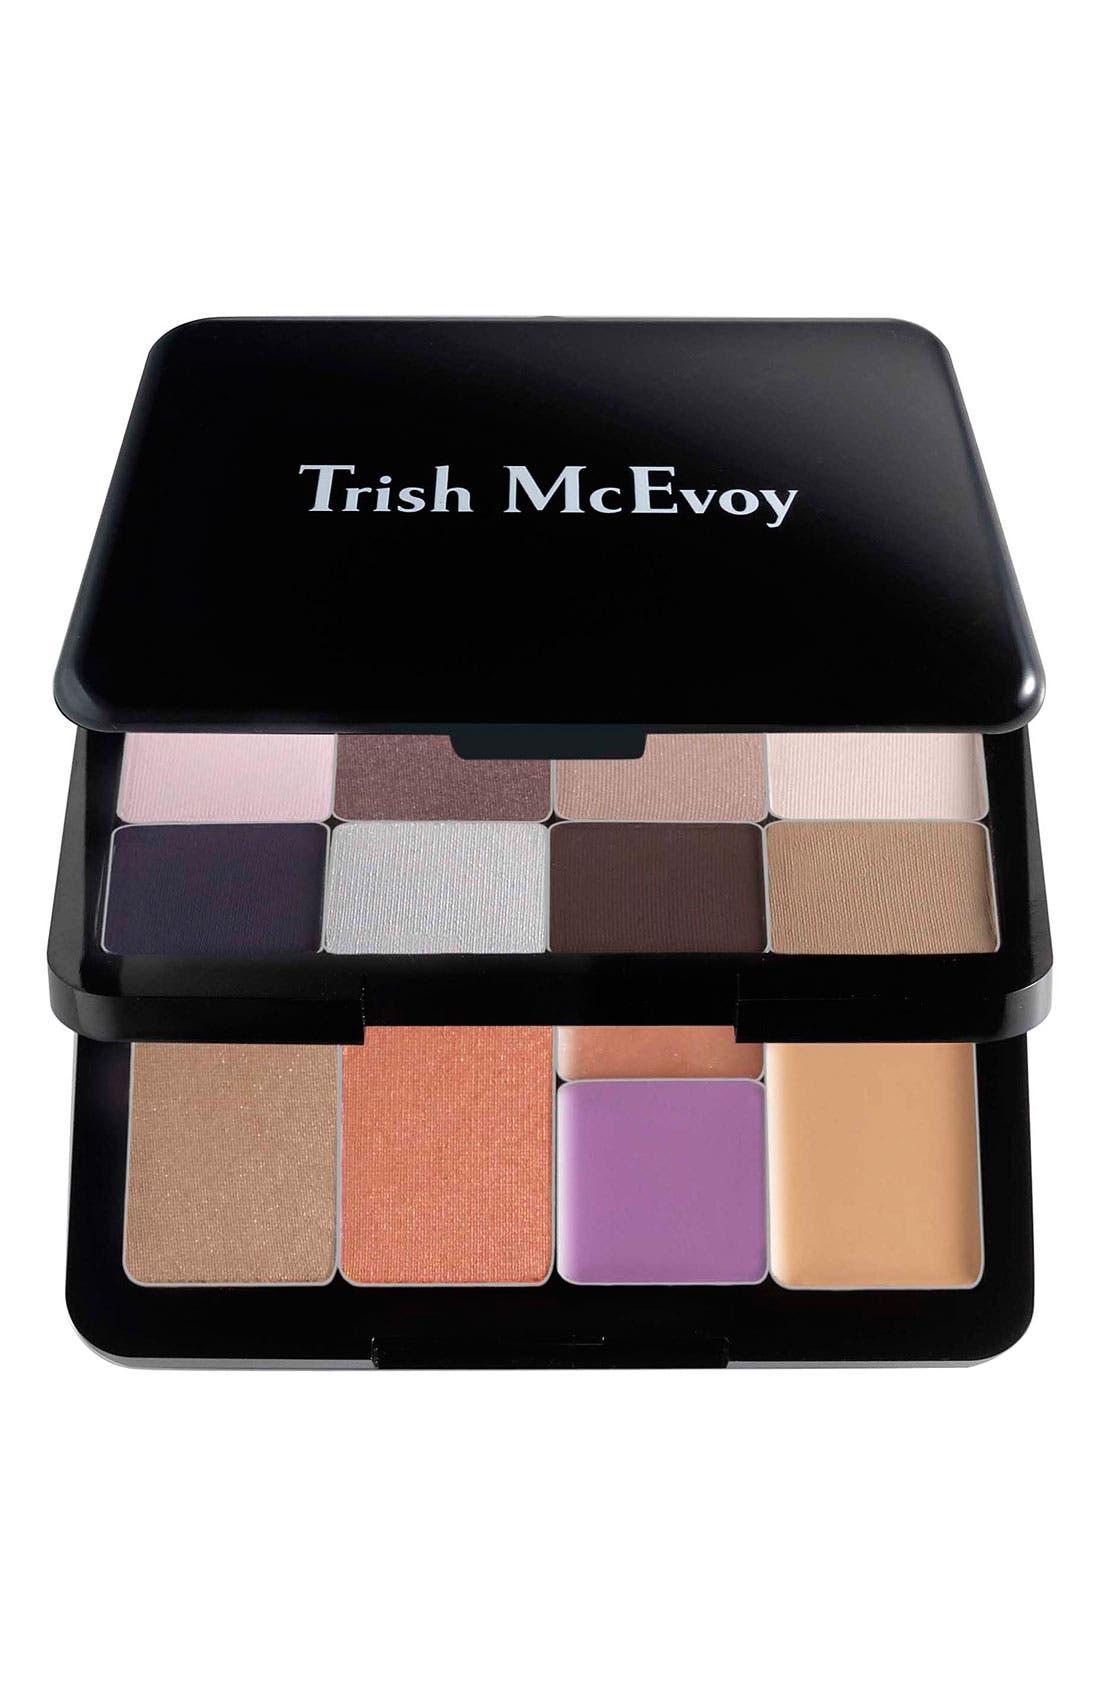 Main Image - Trish McEvoy 'Little Black Card® Effortless Beauty' Gift Set